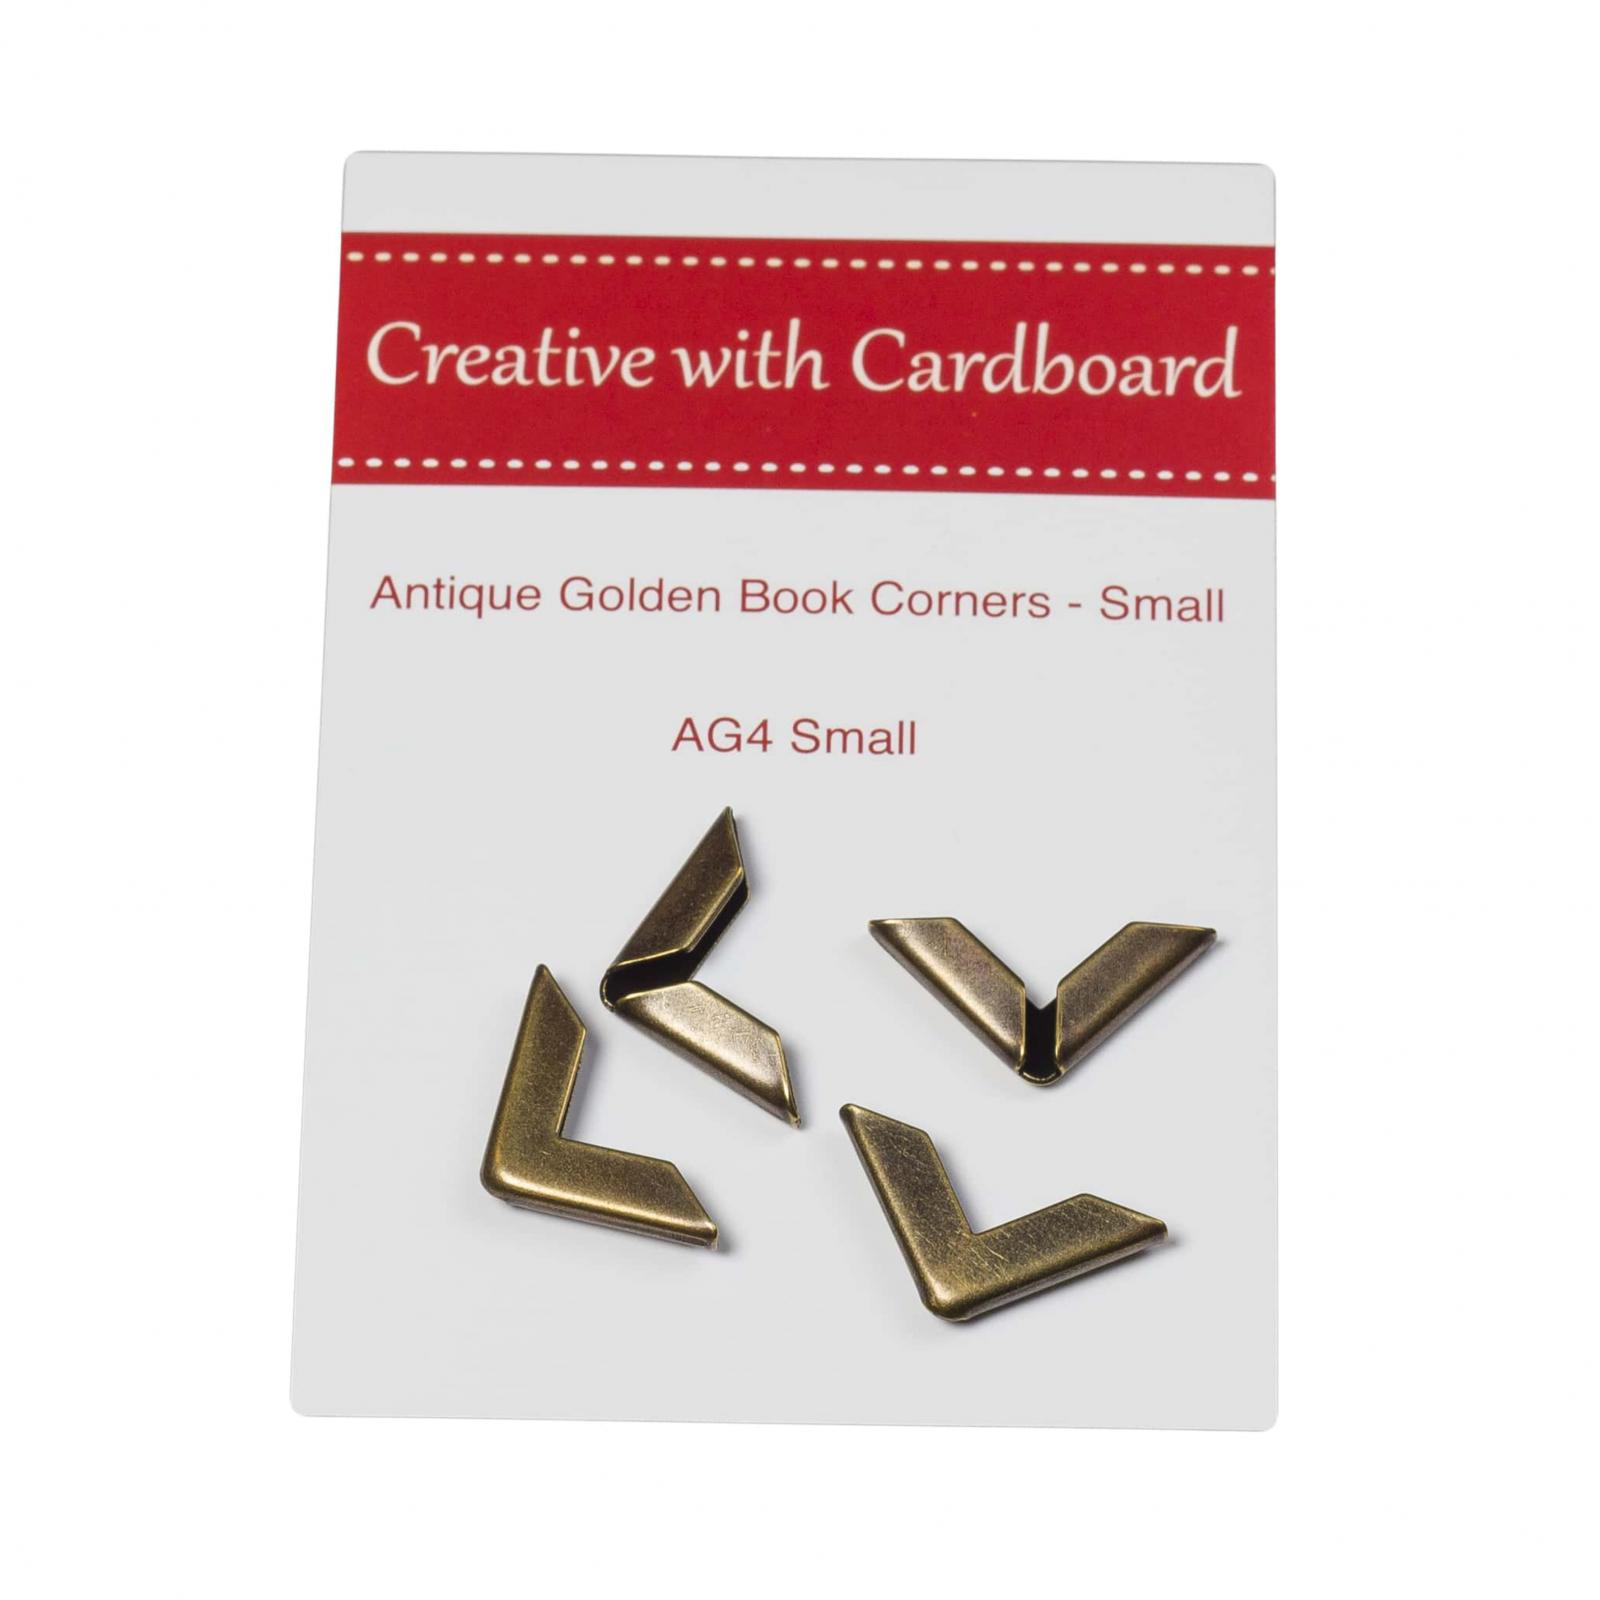 Rinske Stevens Designs: Antique Golden Book Corners Small